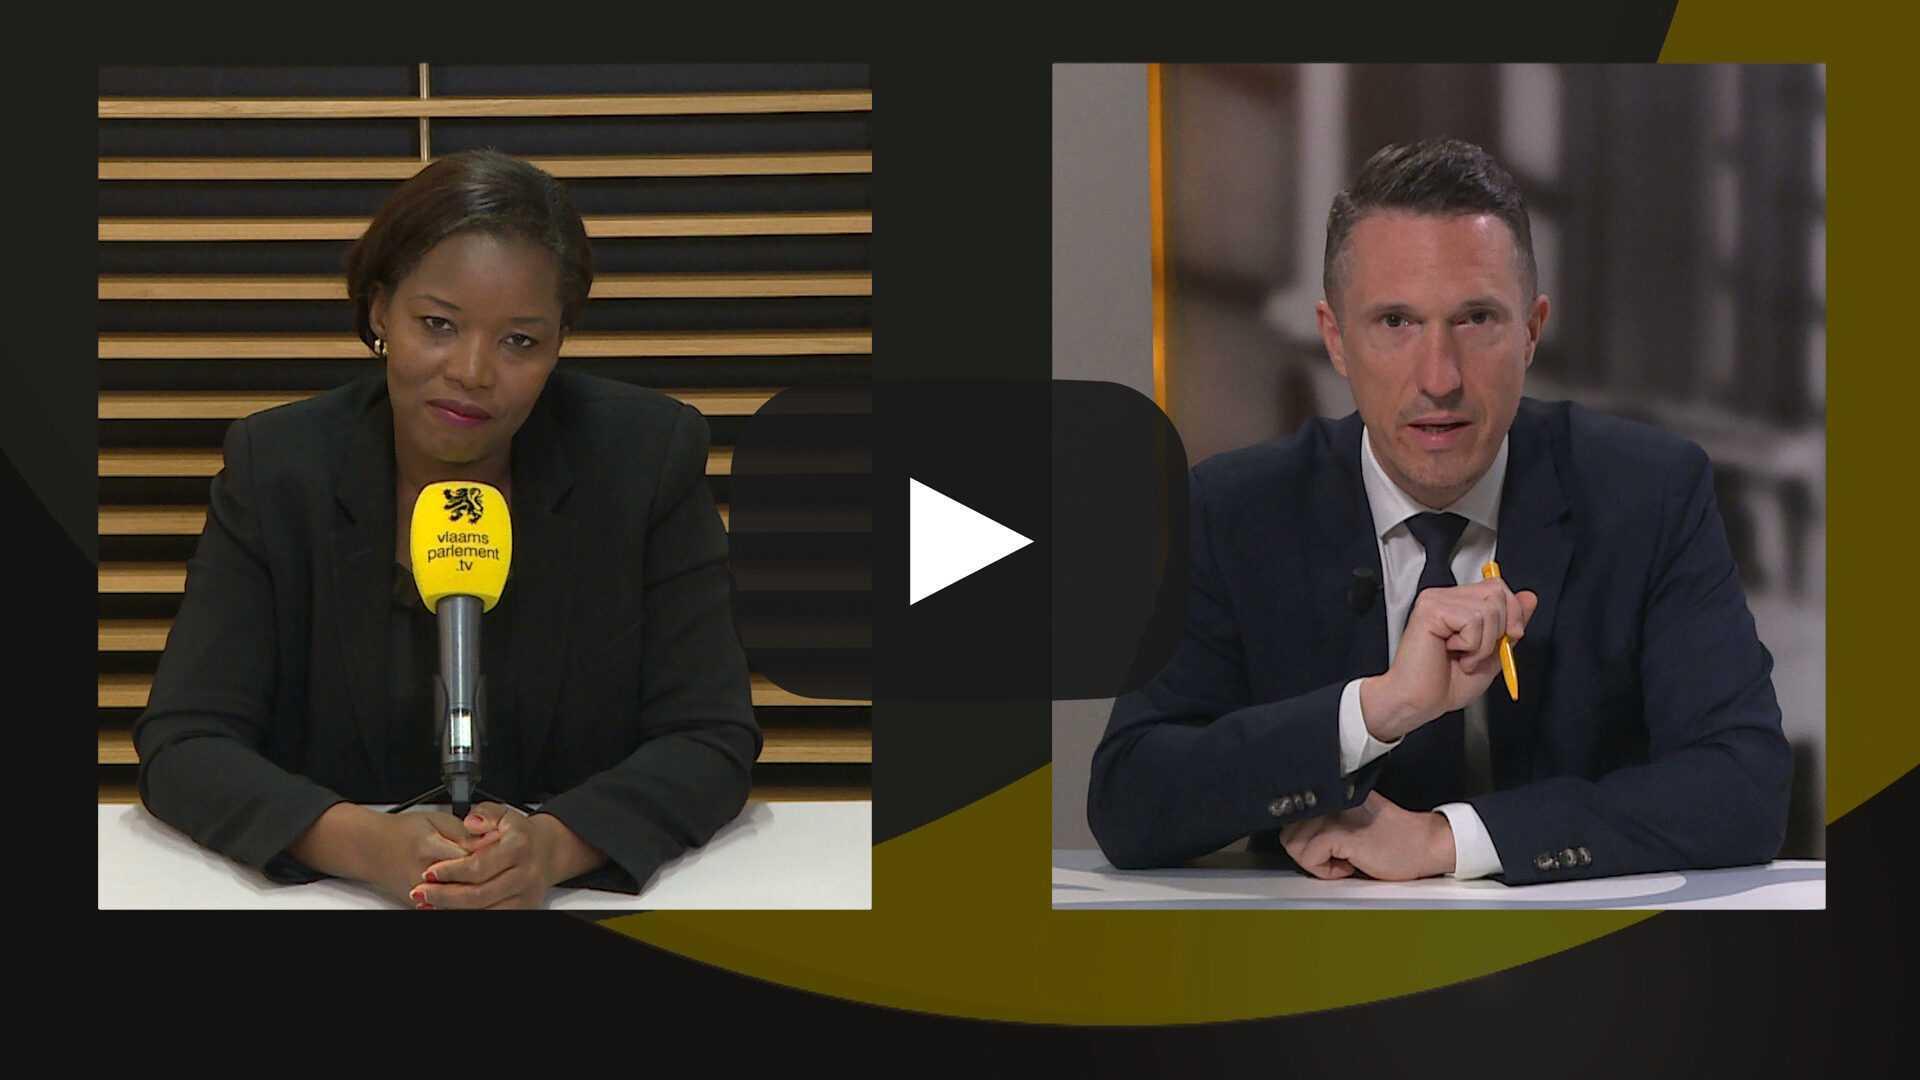 Het Gesprek: Assita Kanko, Europees Parlementslid voor N-VA